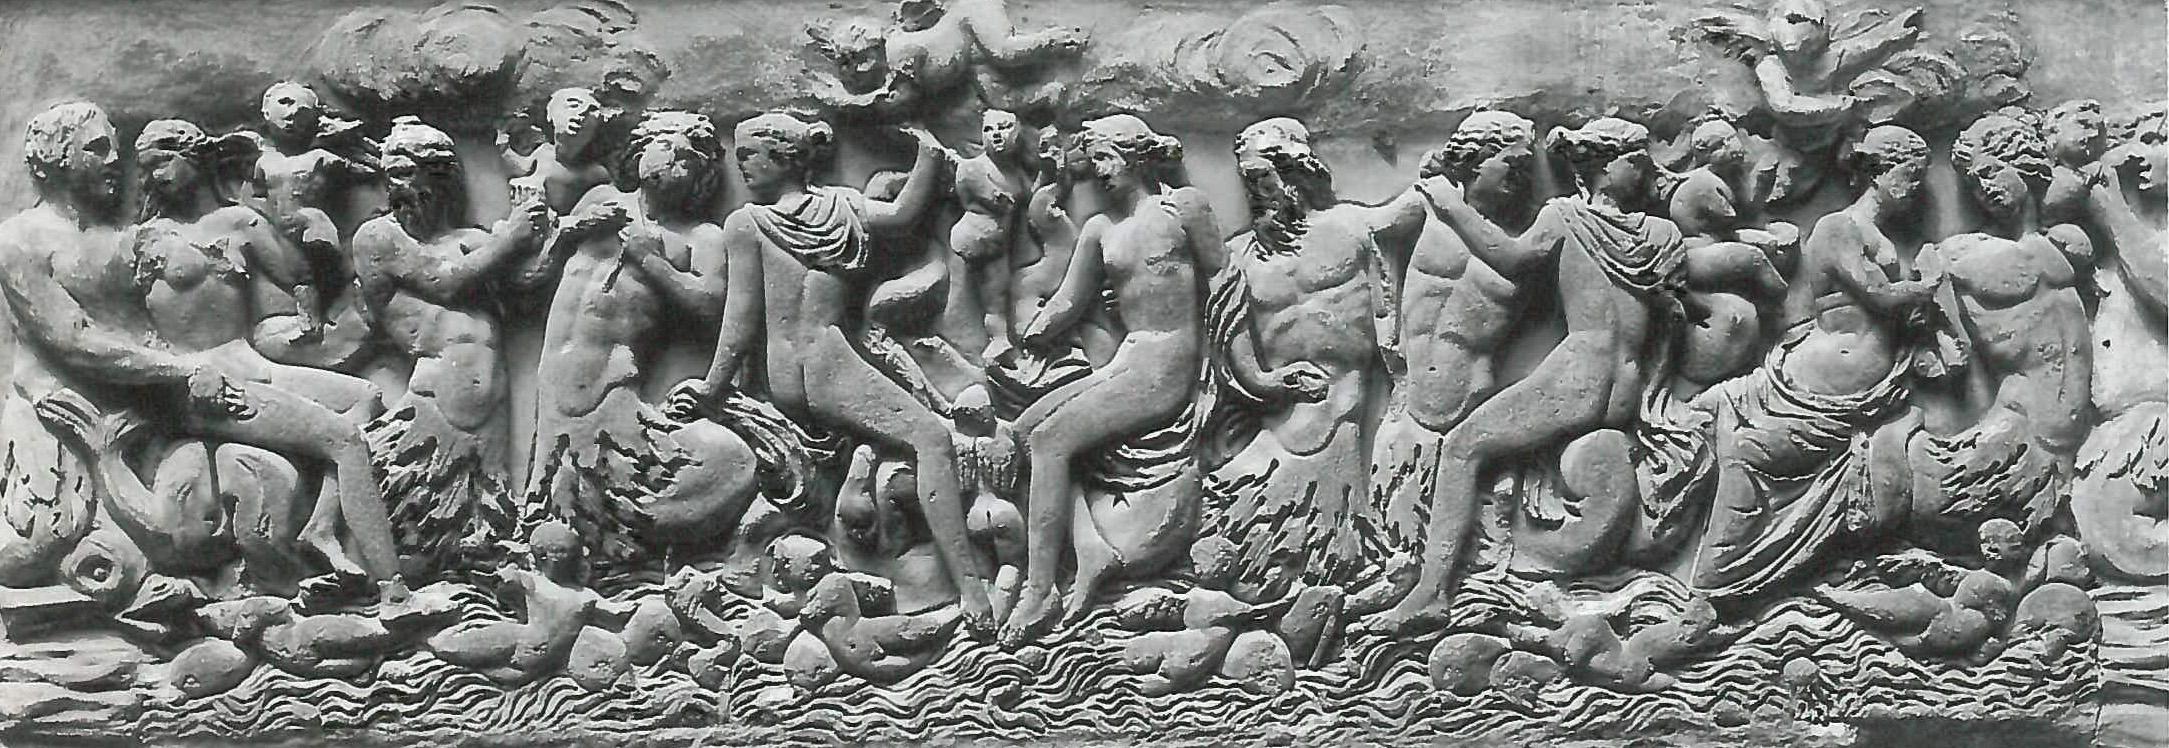 Tritons et nereides Sea-racophagus Musee des Thermes Rome